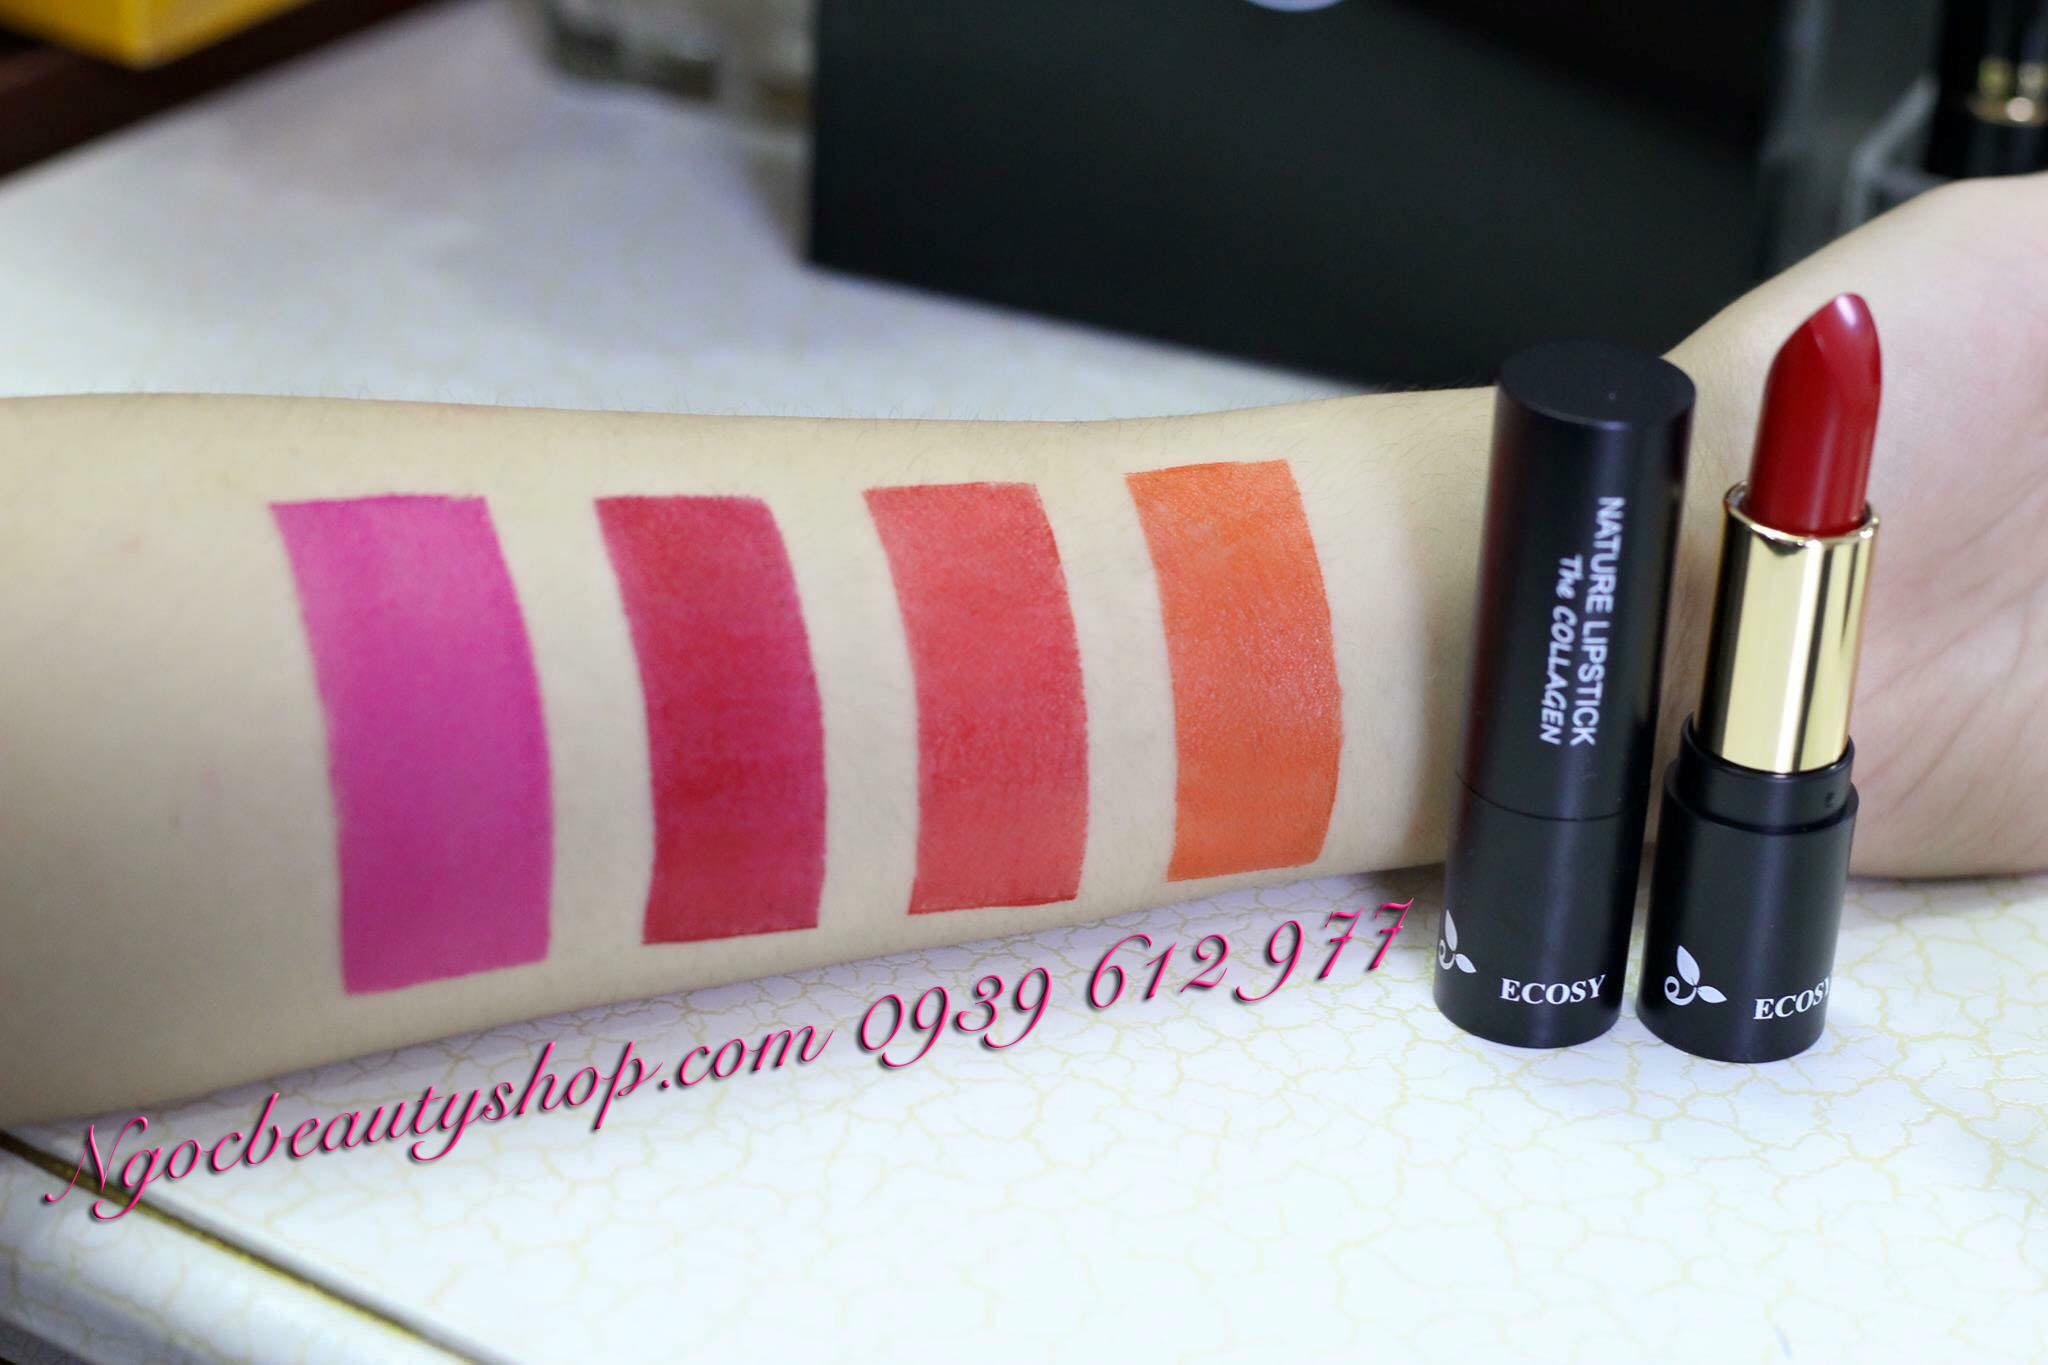 Son-ly-khong-chi-ecosy-nature-lip-stick-the-collagen-han-quoc-ngocbeautyshop.com-0939612977